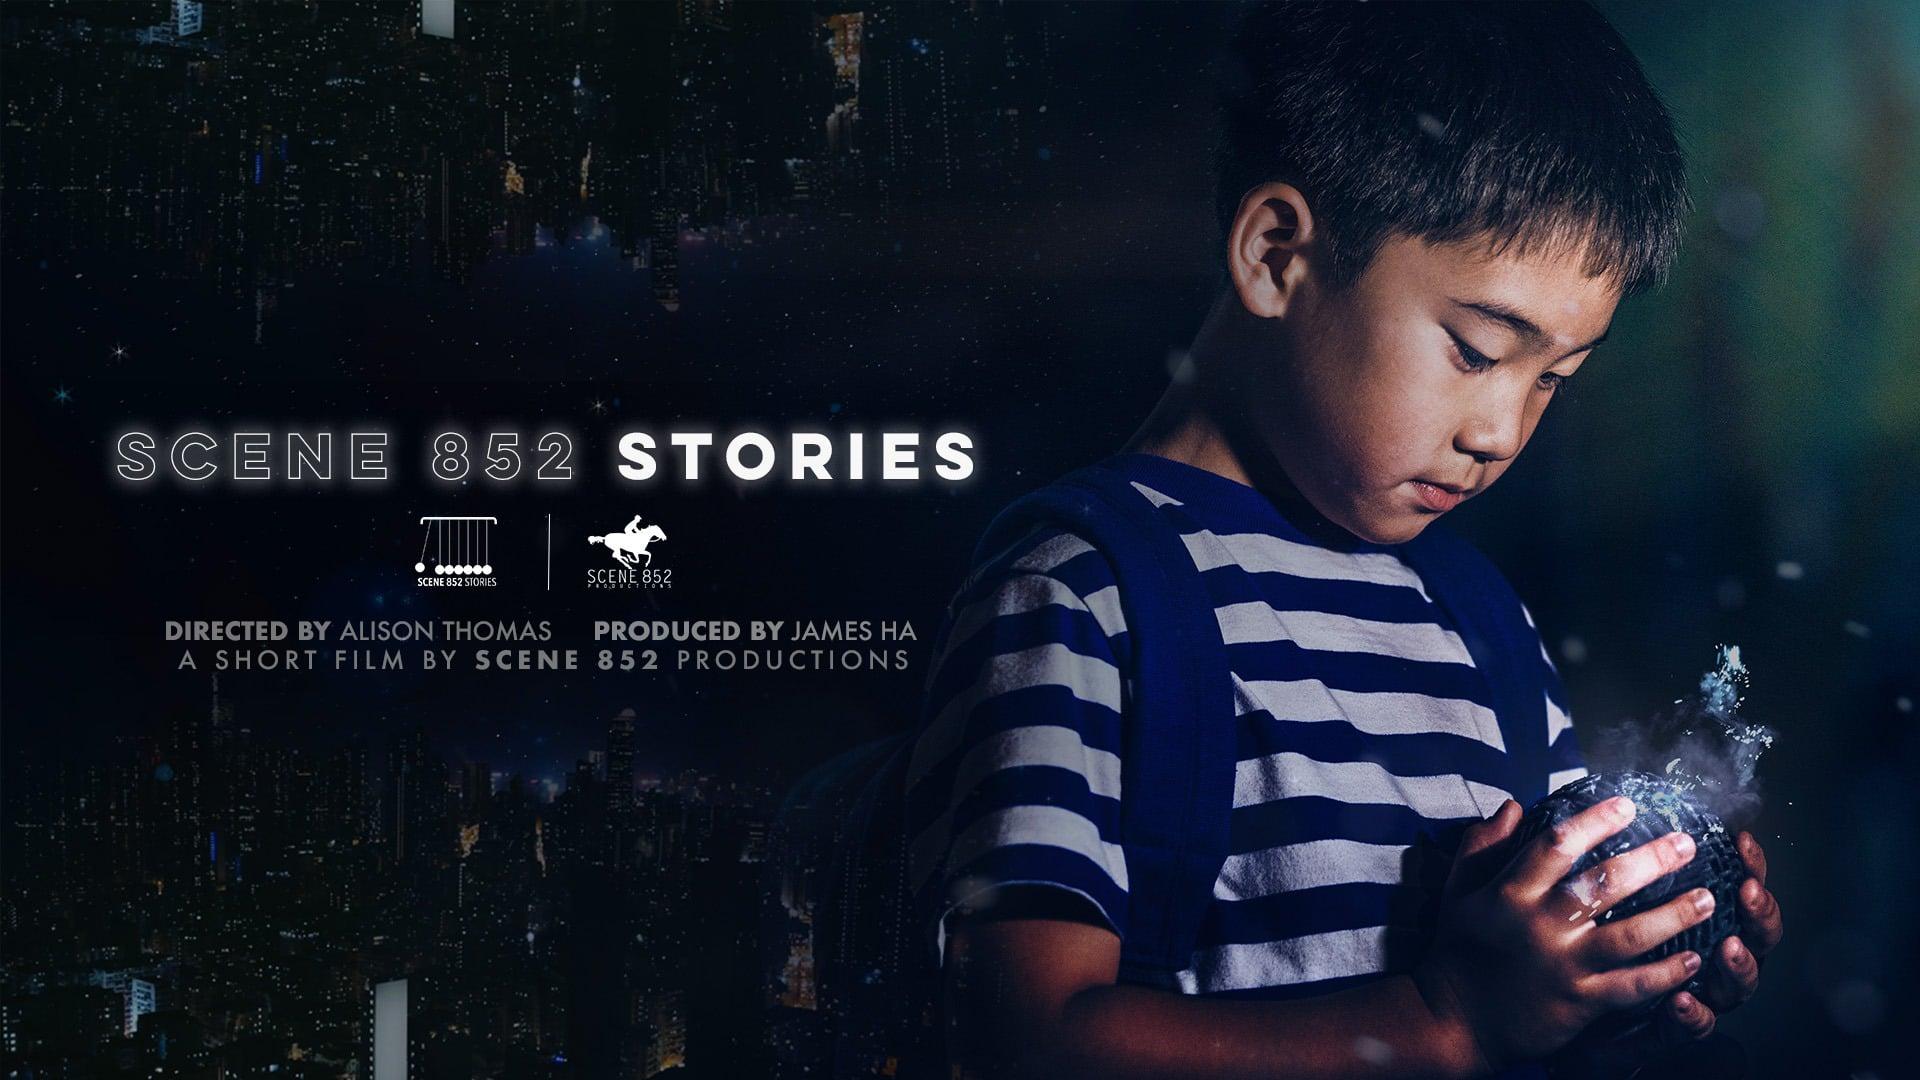 SCENE 852 STORIES